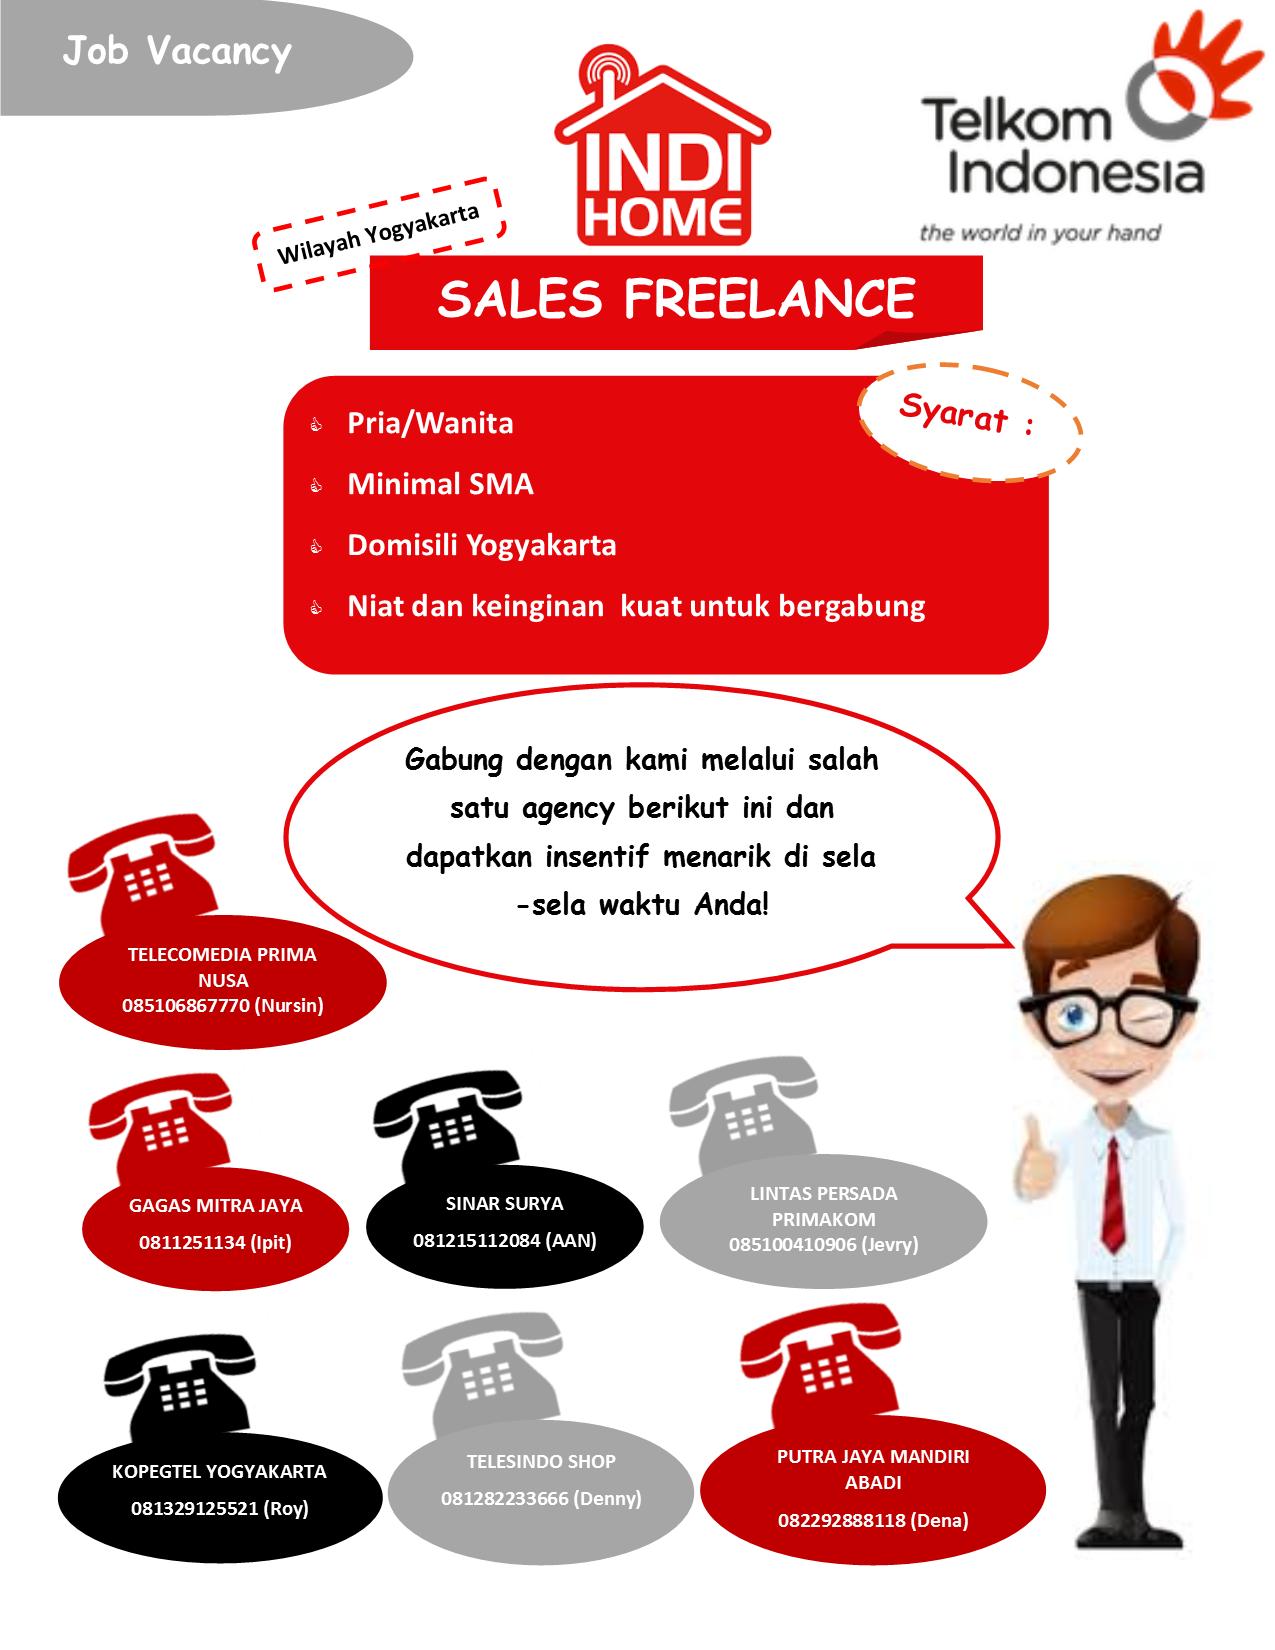 Indihome Sales Freelance Studentjob Indonesia